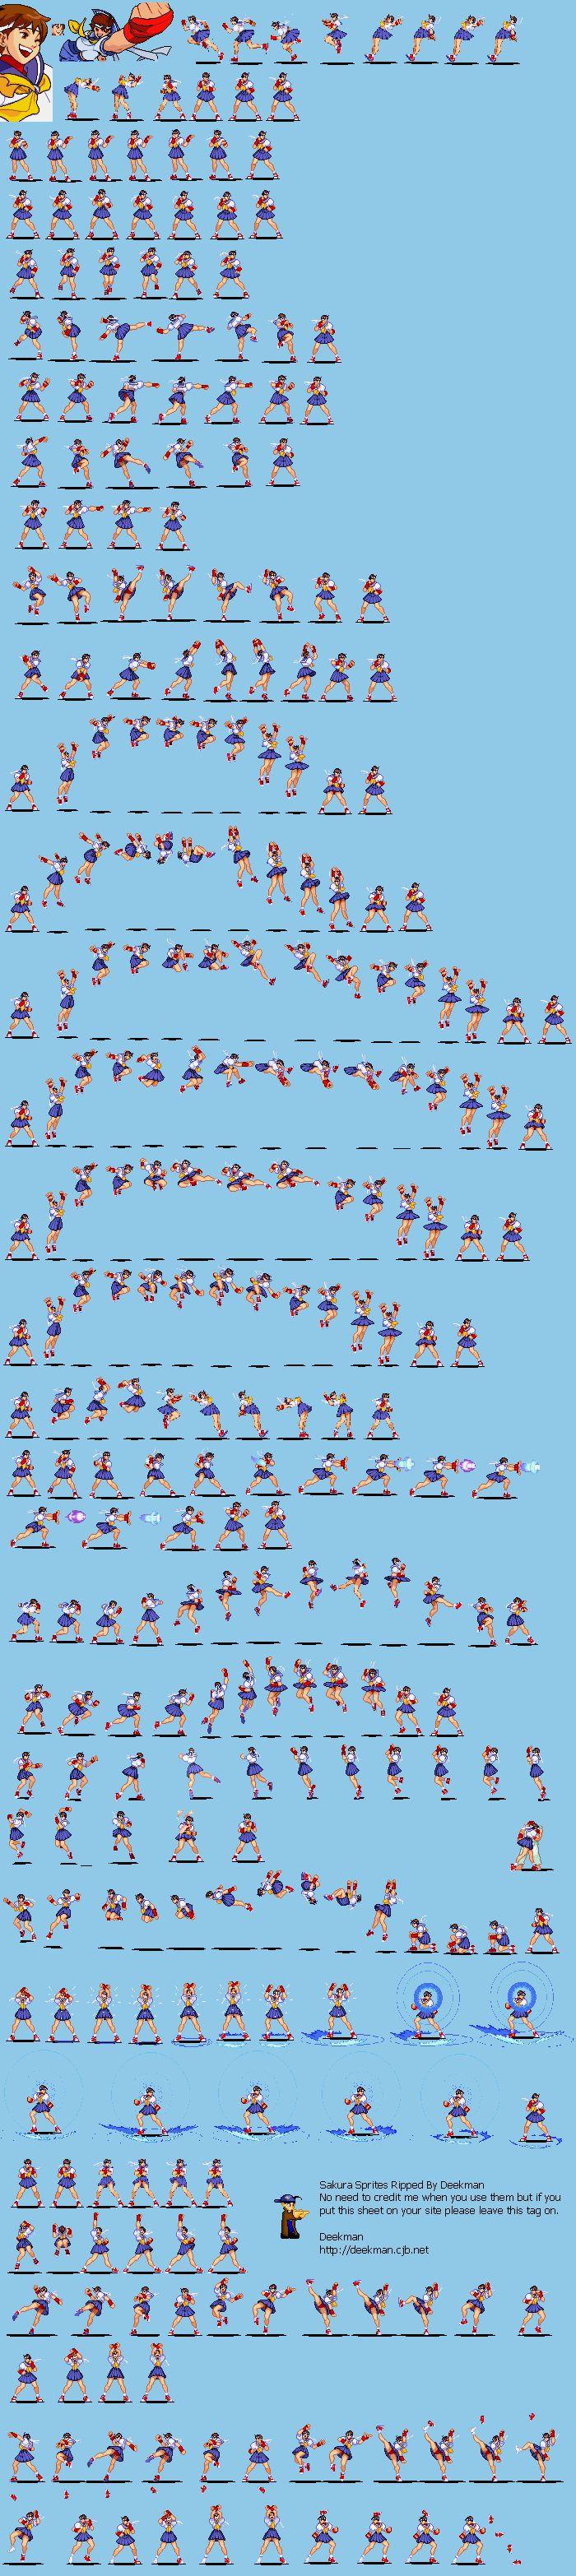 Sakura Sprite sheets Pinterest Animation and Sprites